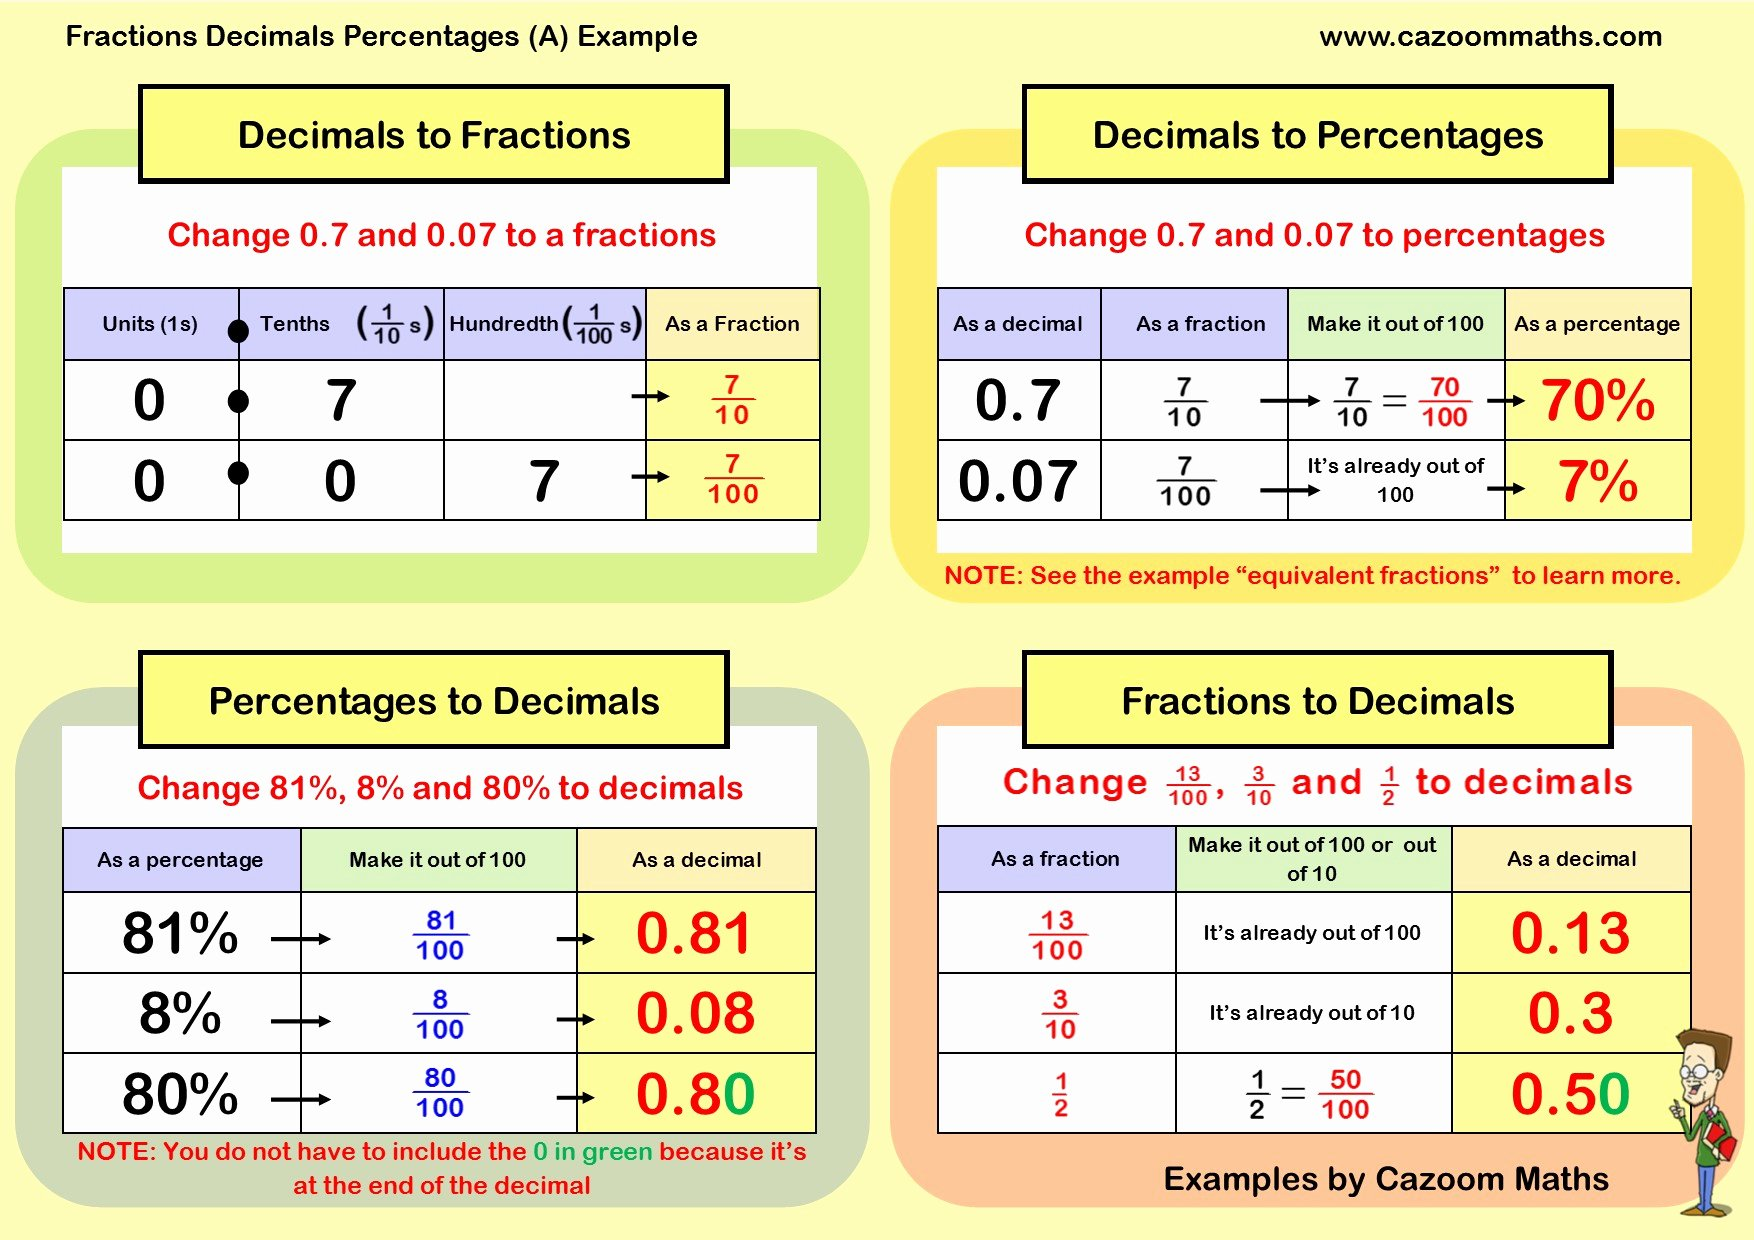 Fraction Decimal Percent Worksheet Pdf New Convert Percent to Decimal Worksheet Picture Worksheet